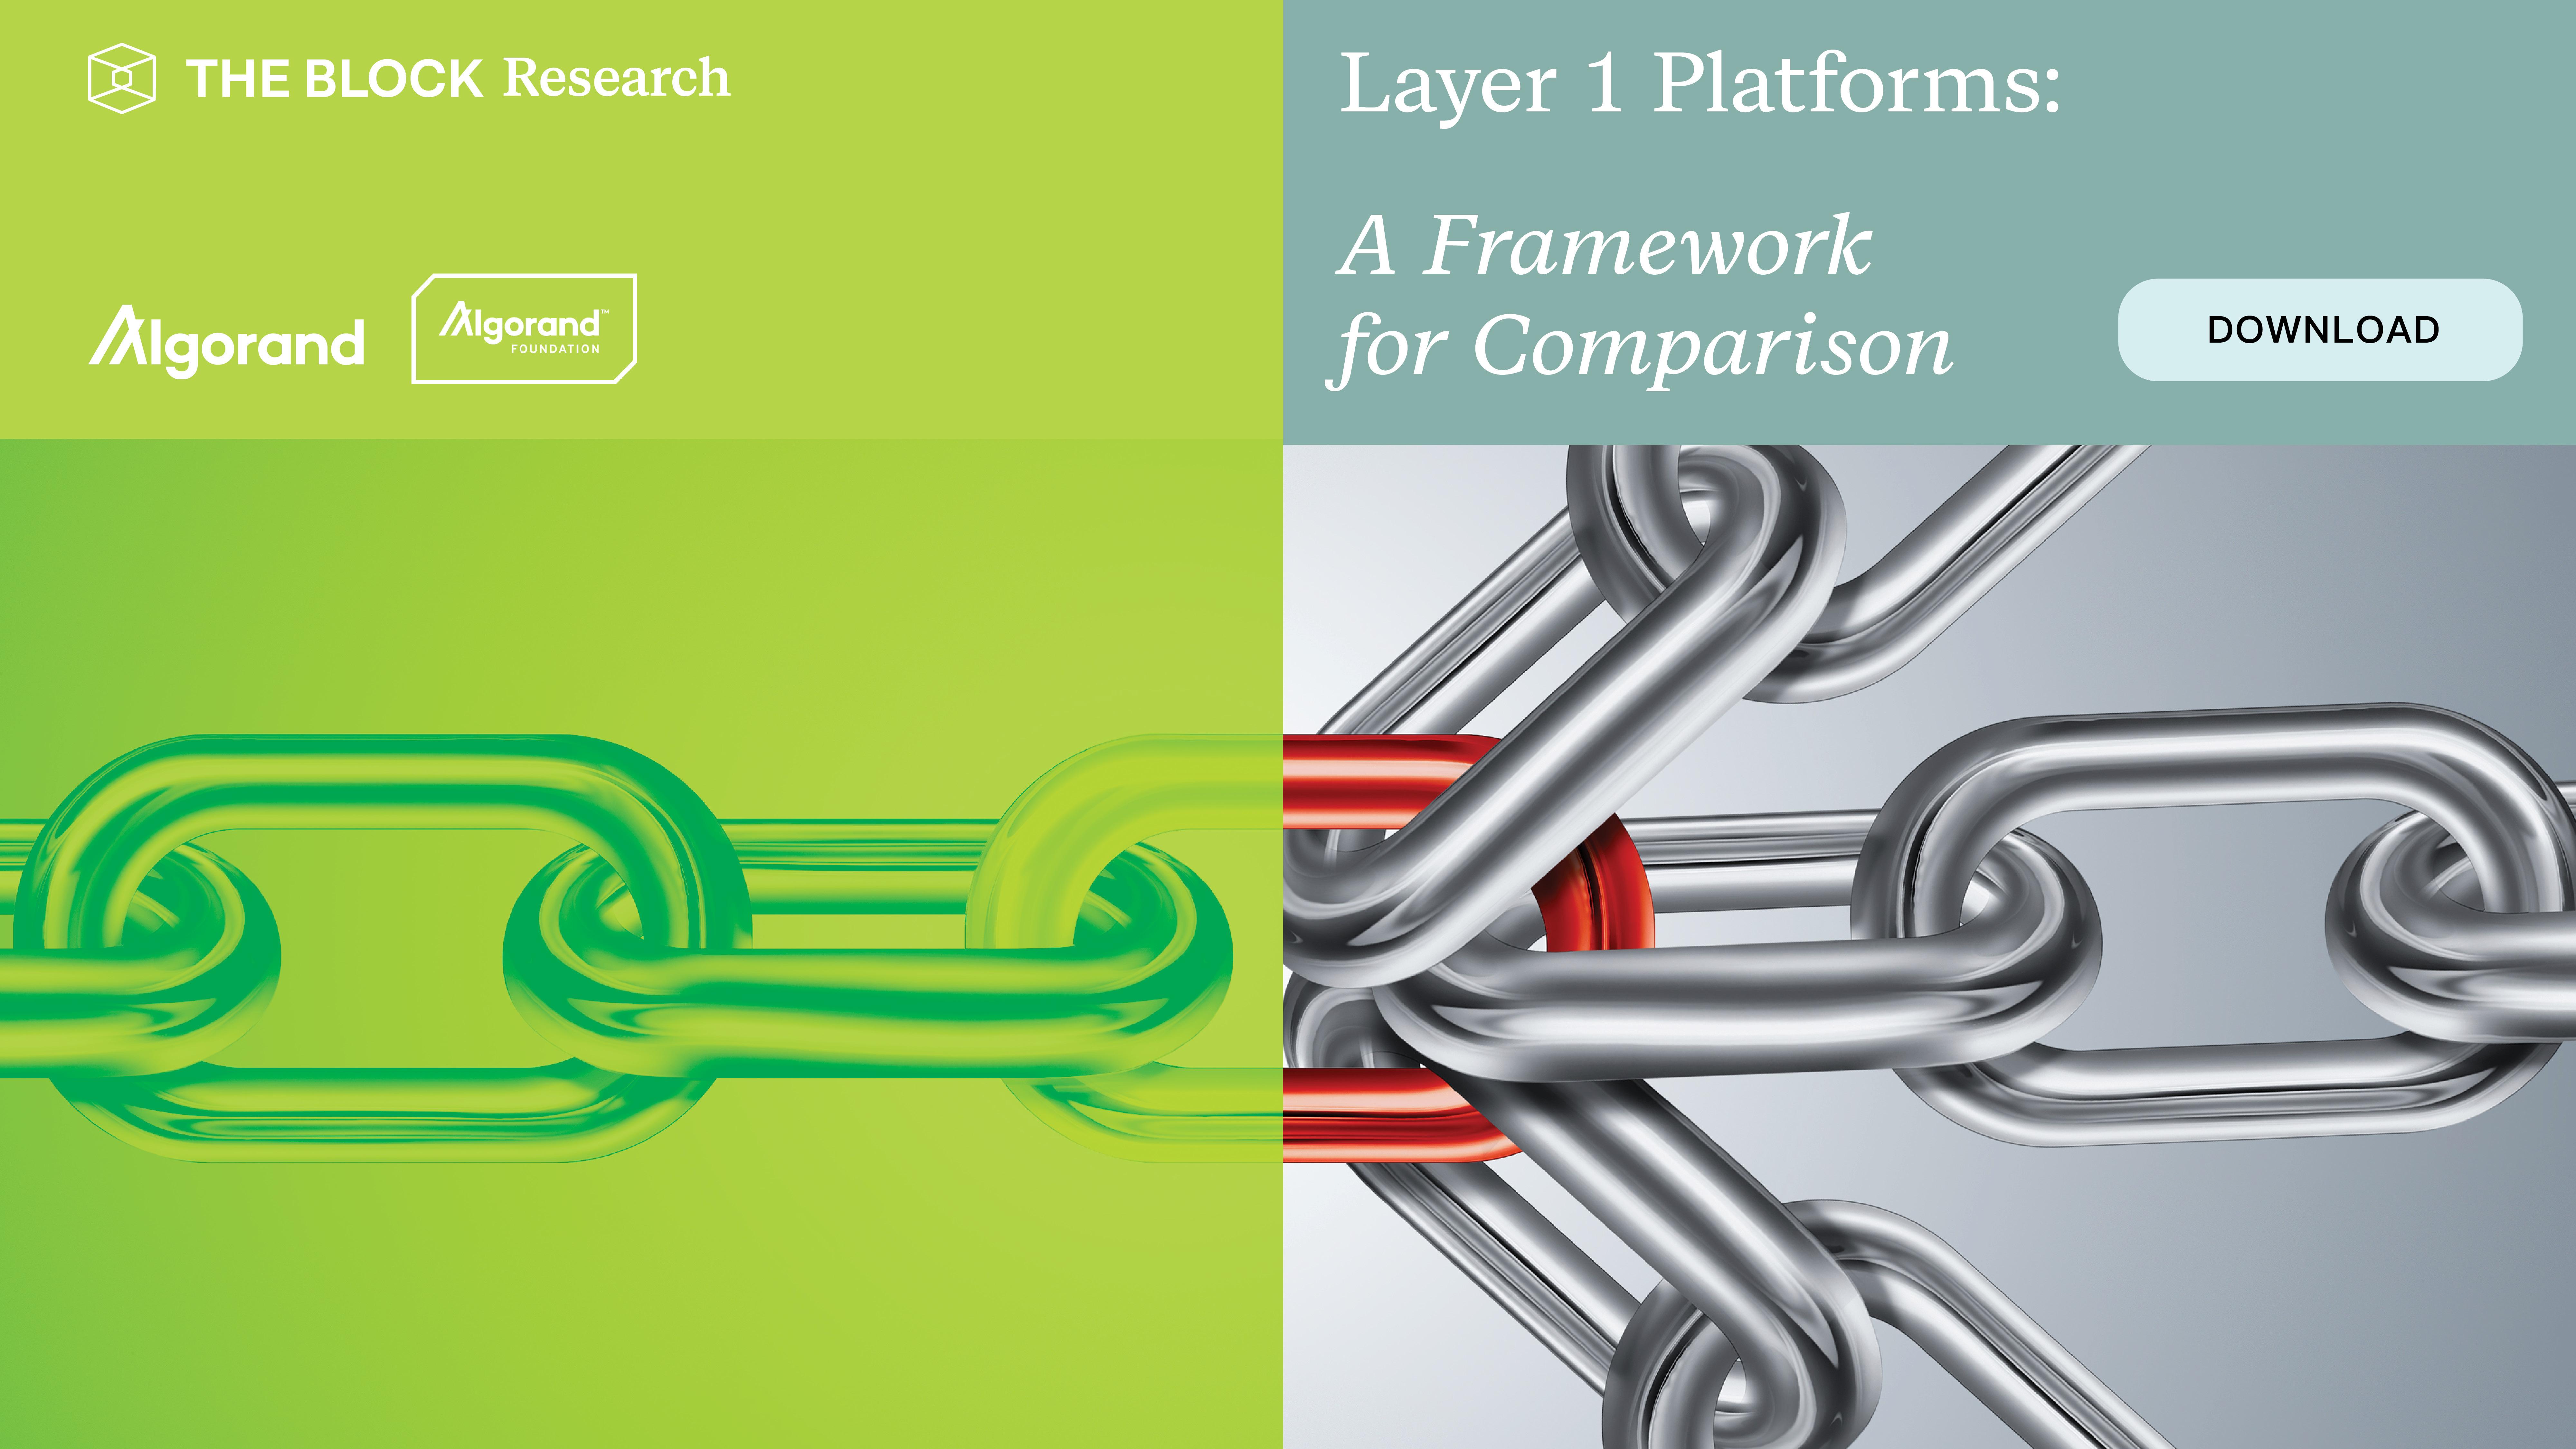 Layer-1 Platforms: A Framework for Comparison